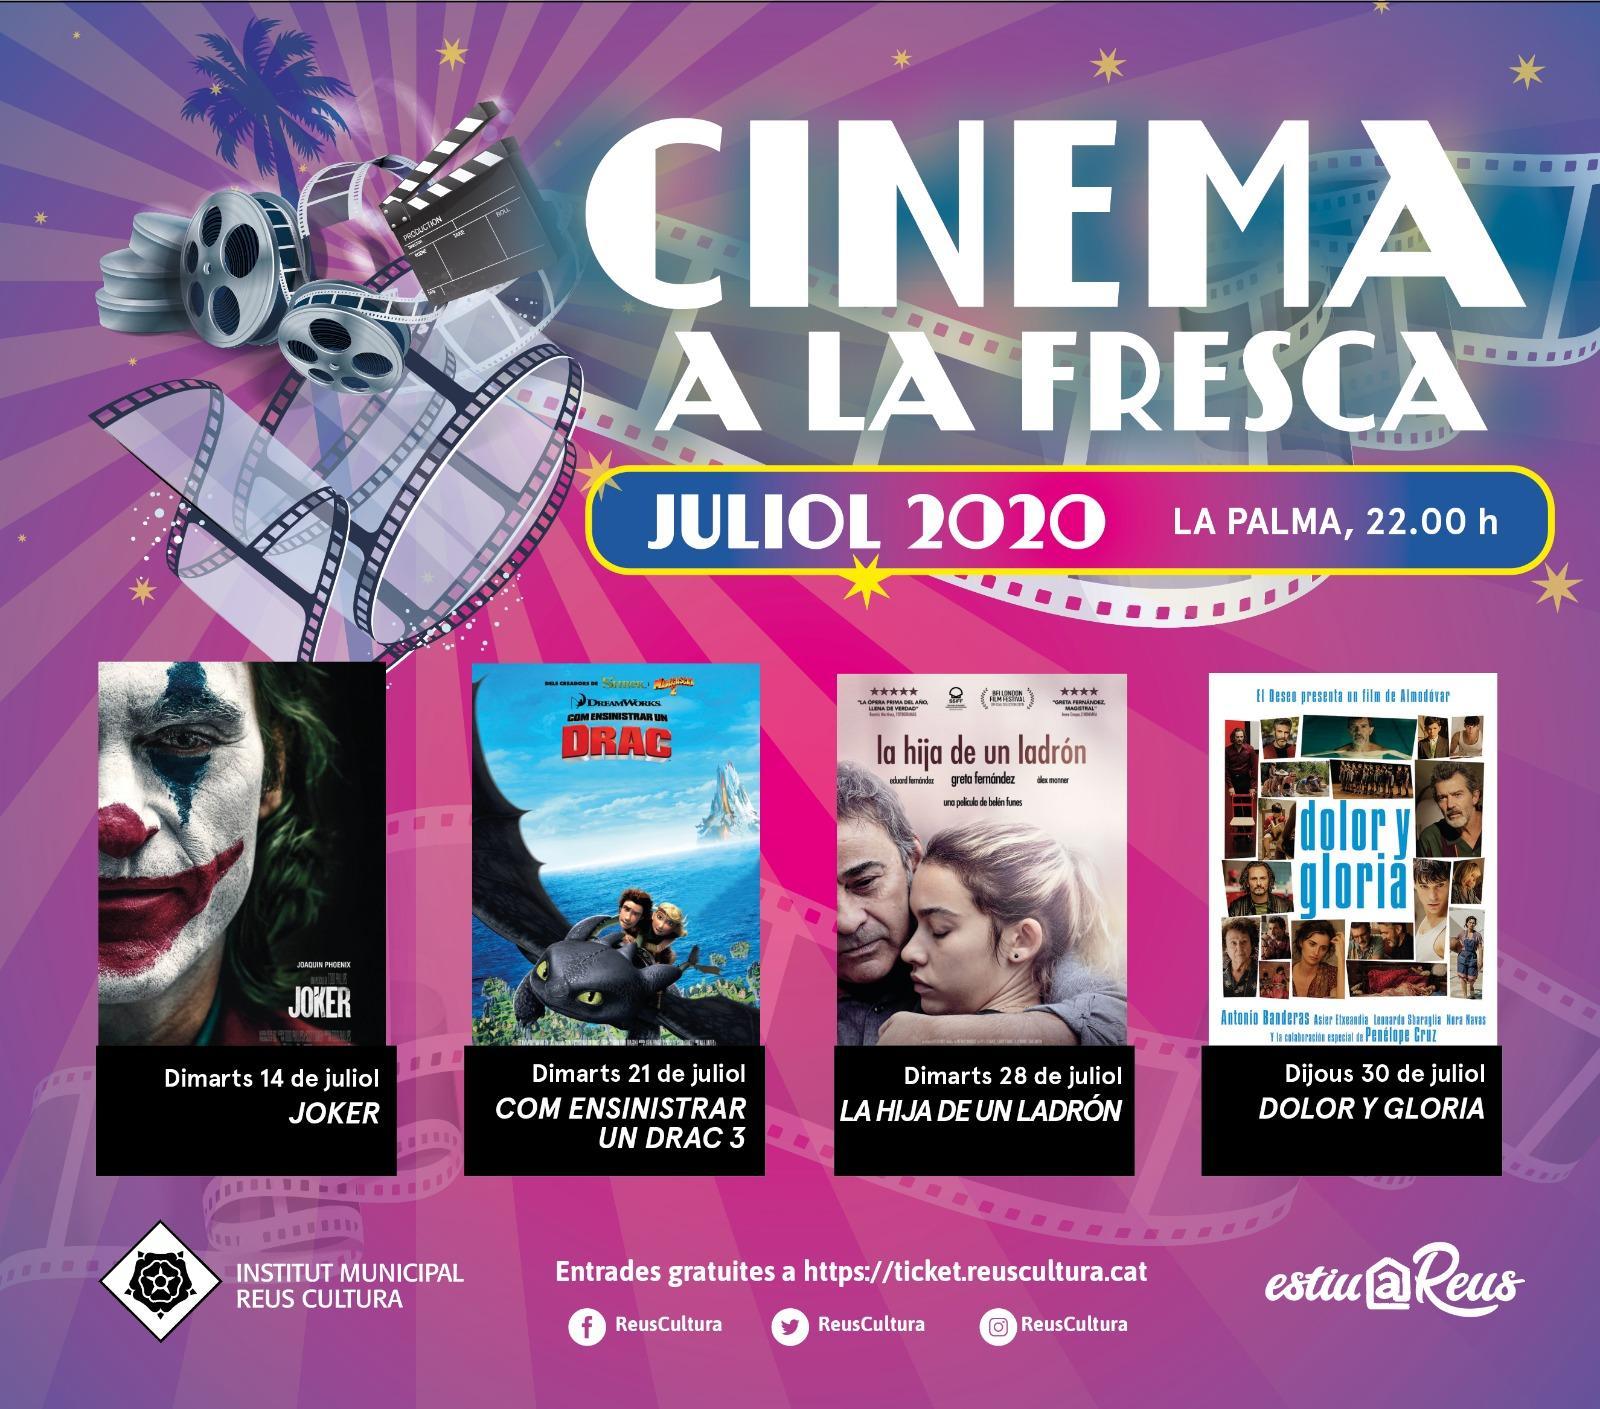 Cinema a la fresca (14, 21, 28 i 30 de juliol) - La PalmaE